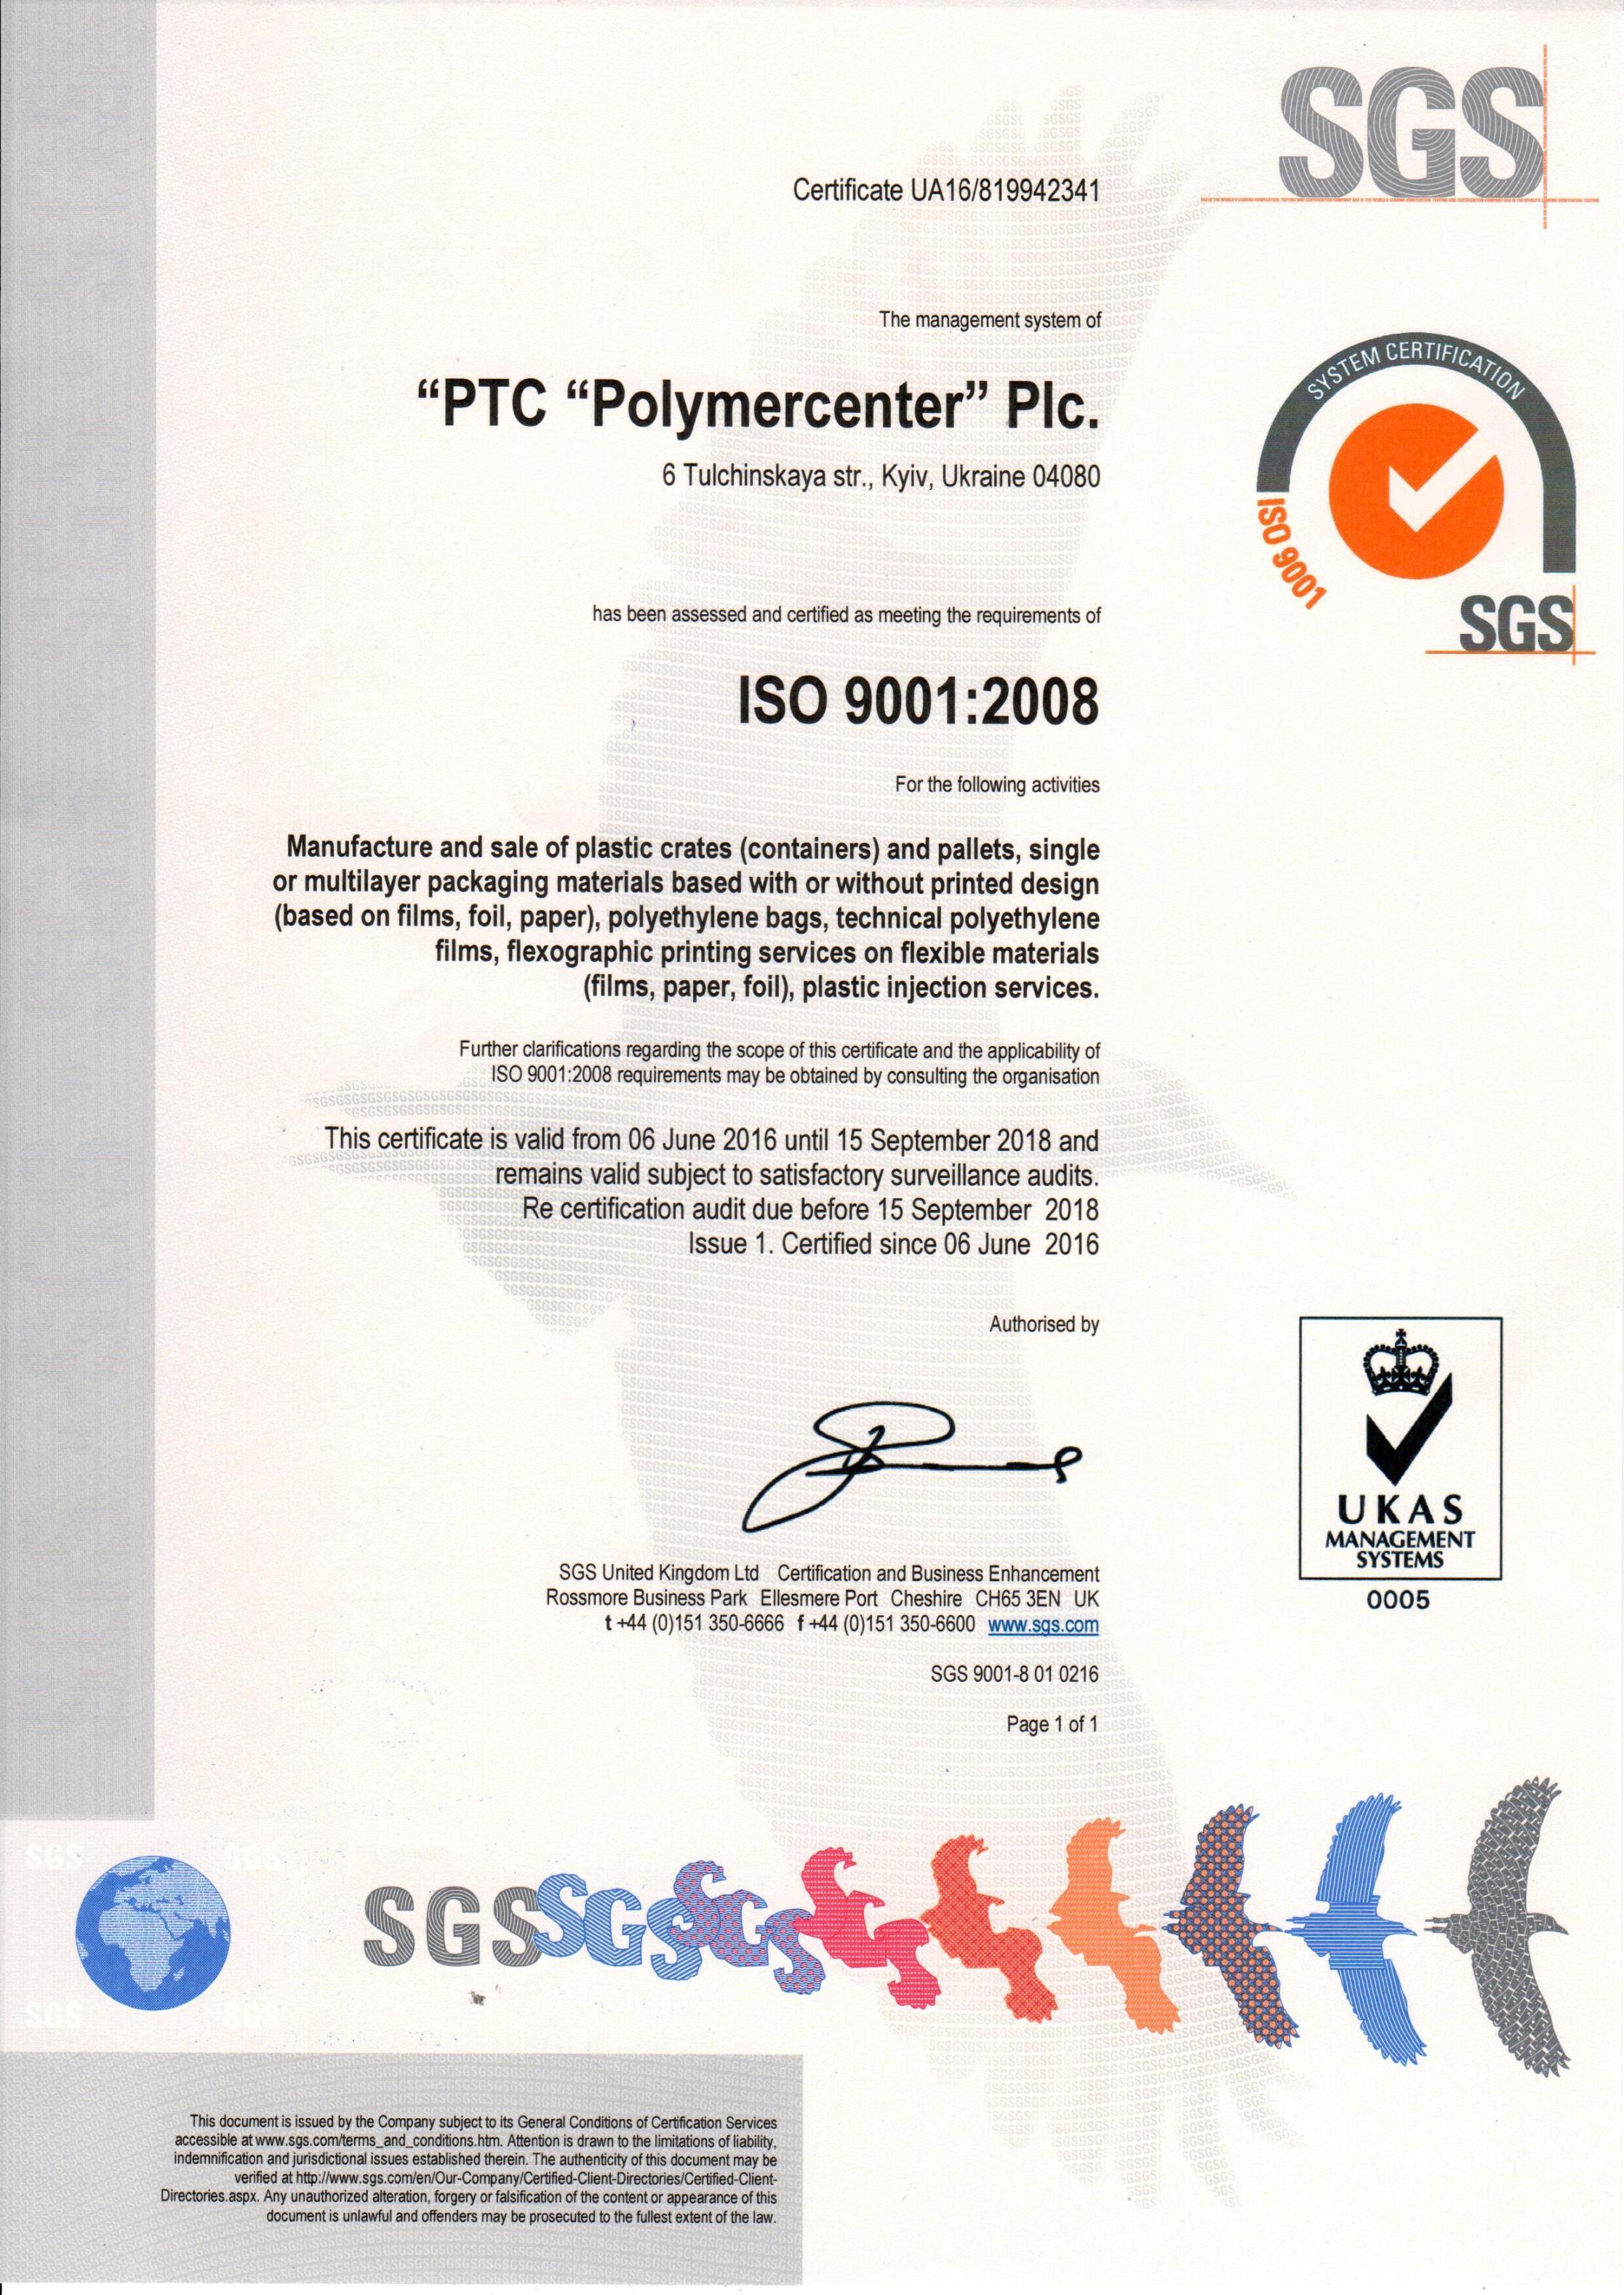 Polymercenter - ISO 9001:2008